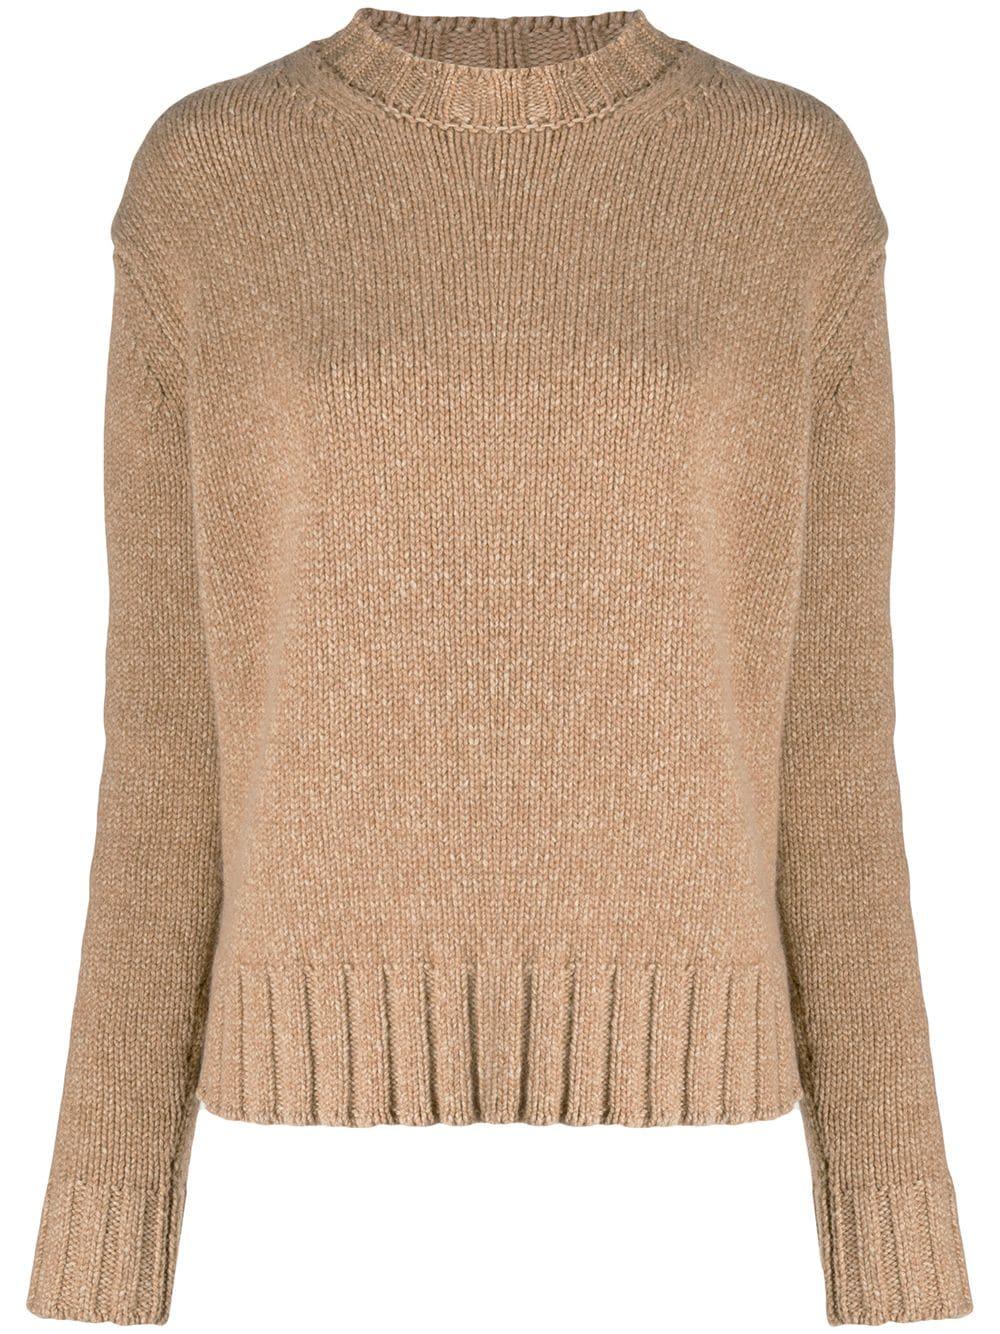 Victoria Beckham Gerippter Pullover - Nude